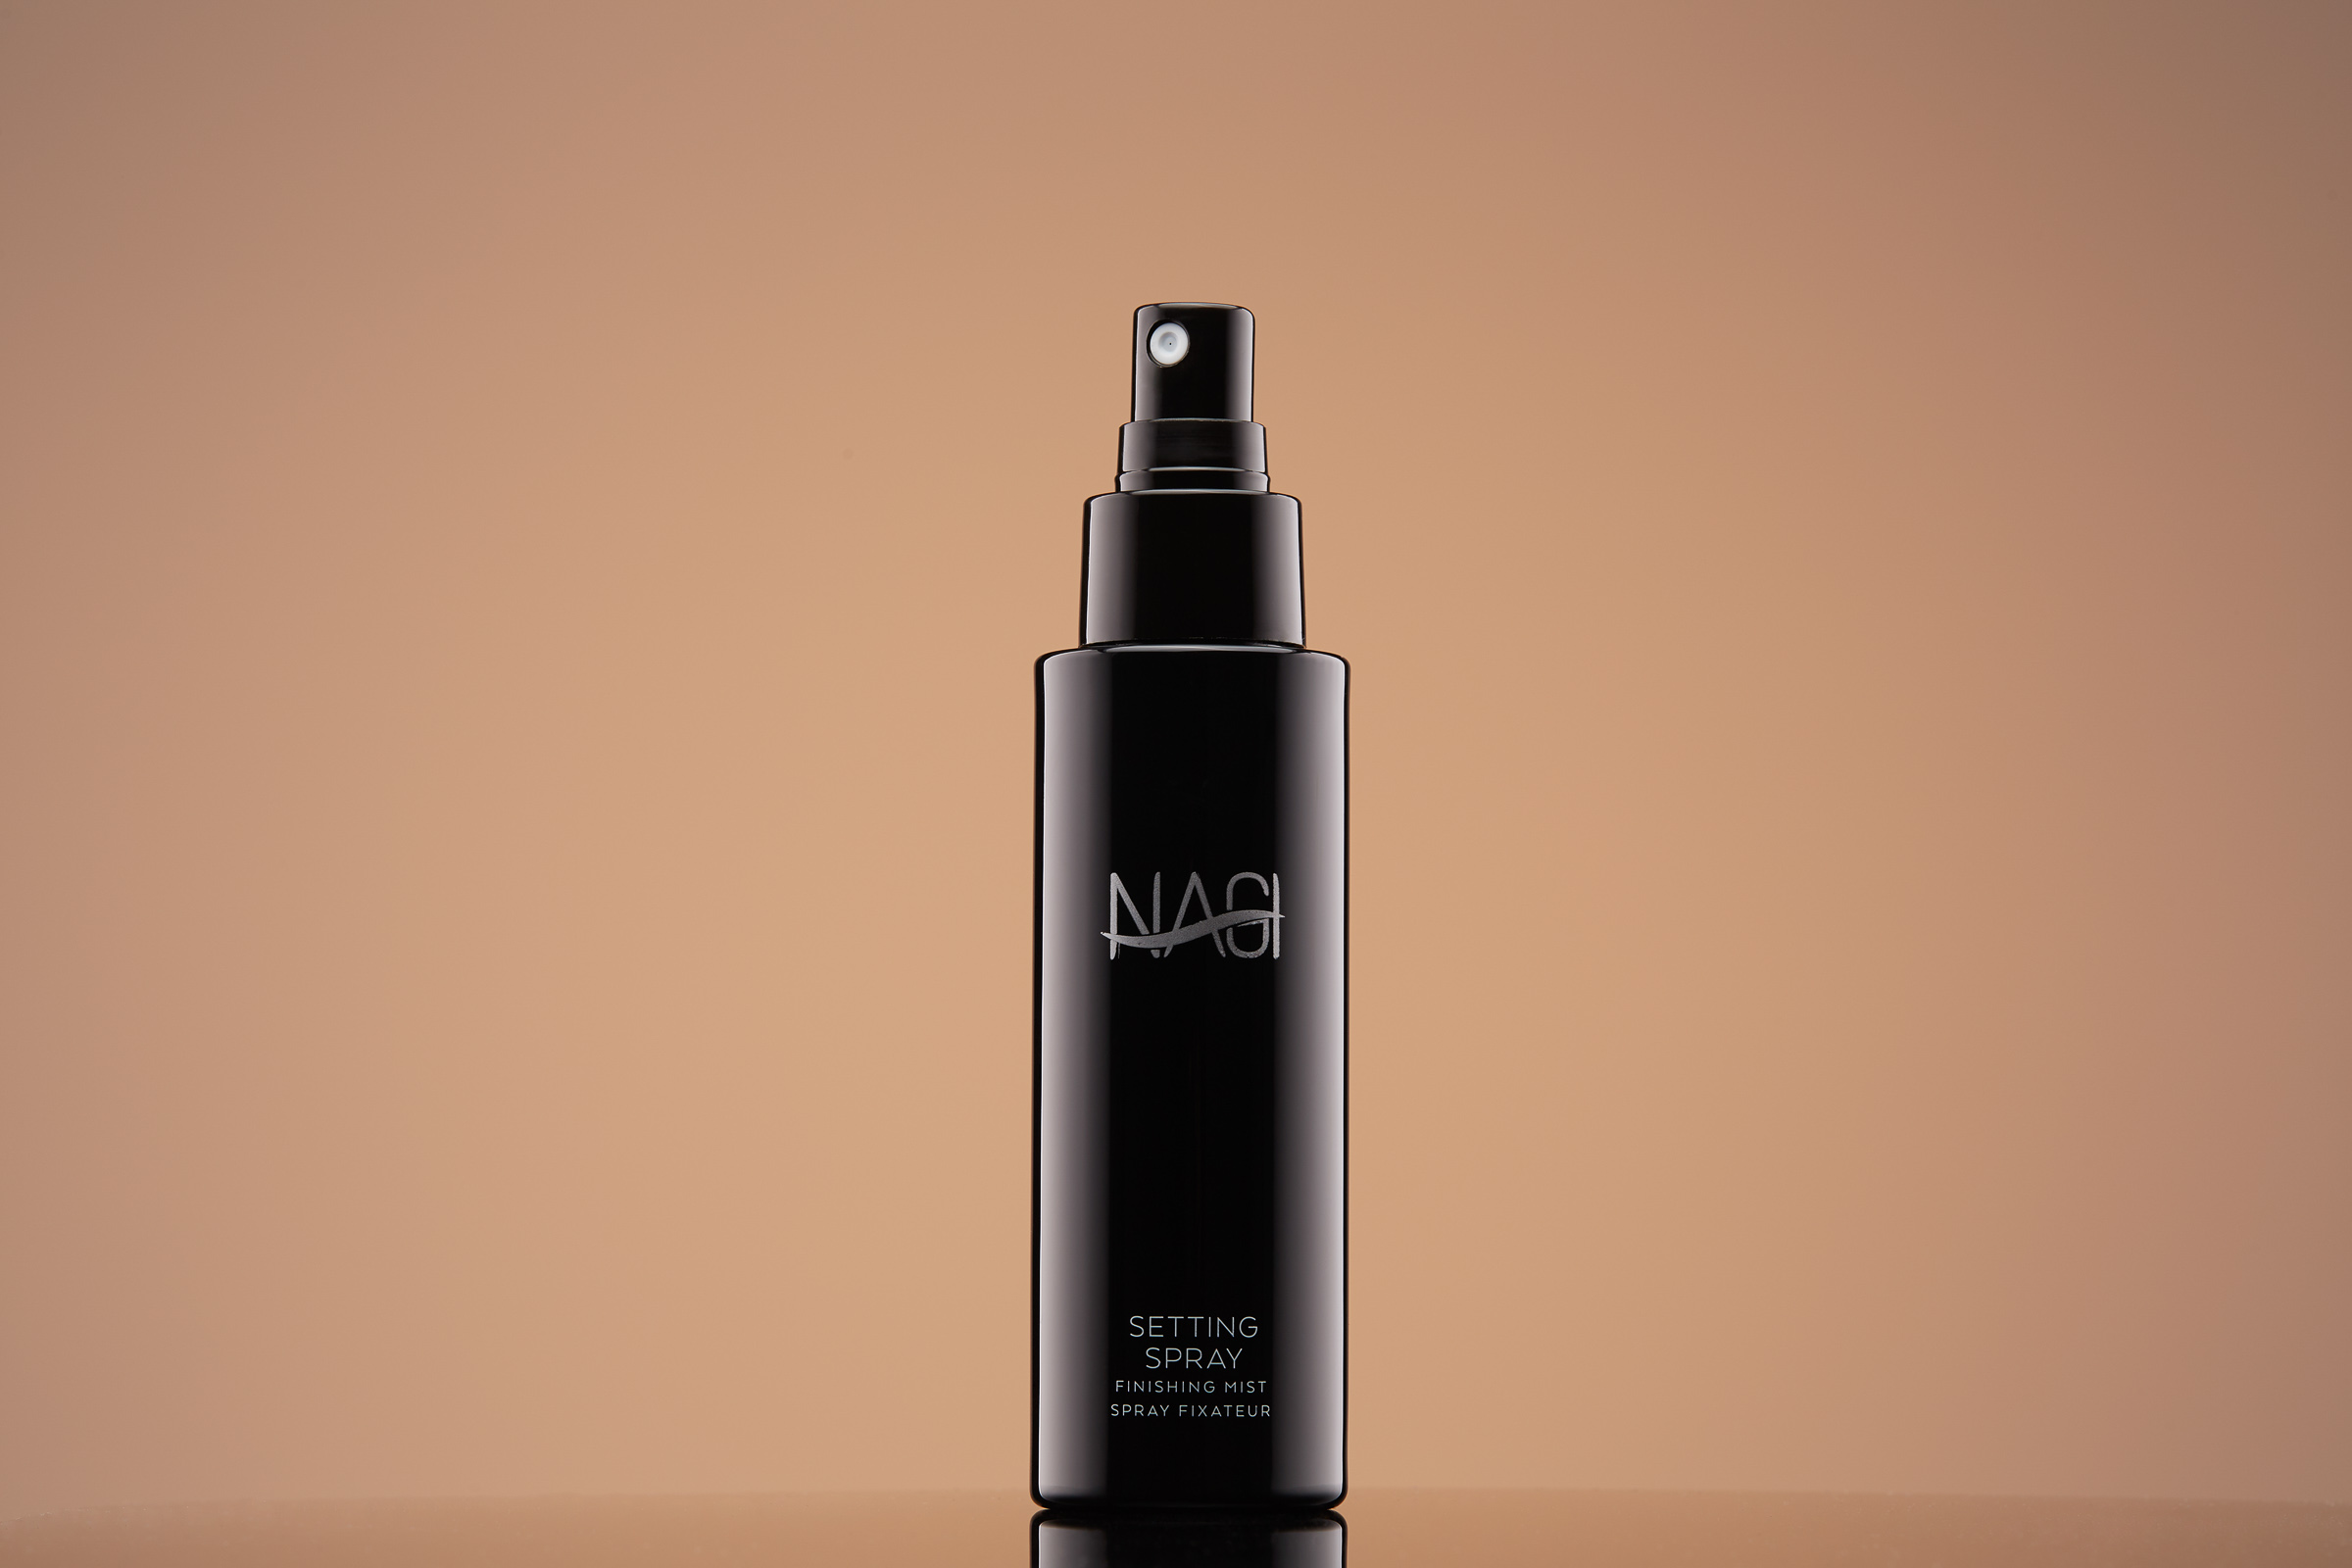 photographe-produit-cosmetique-nagi